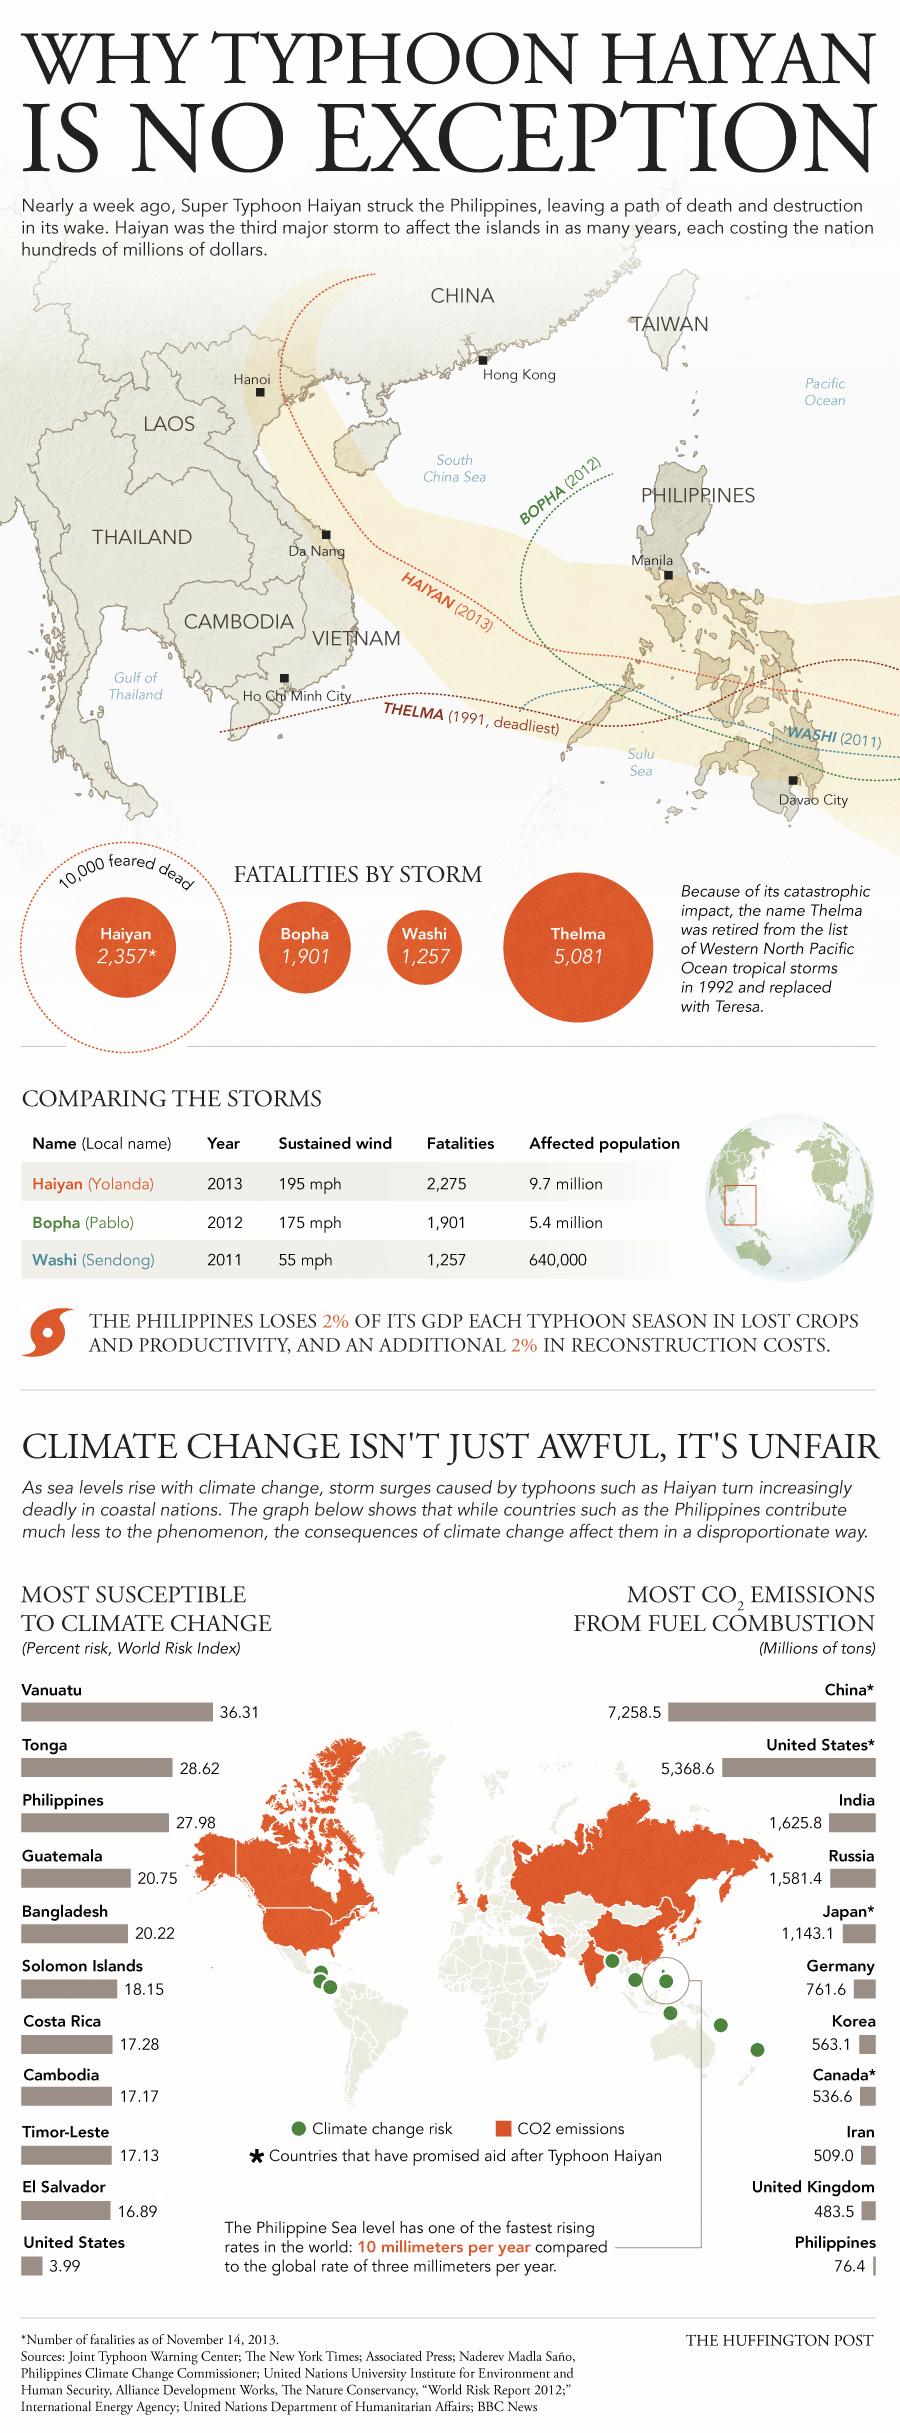 Typhoon Haiyan Infographic